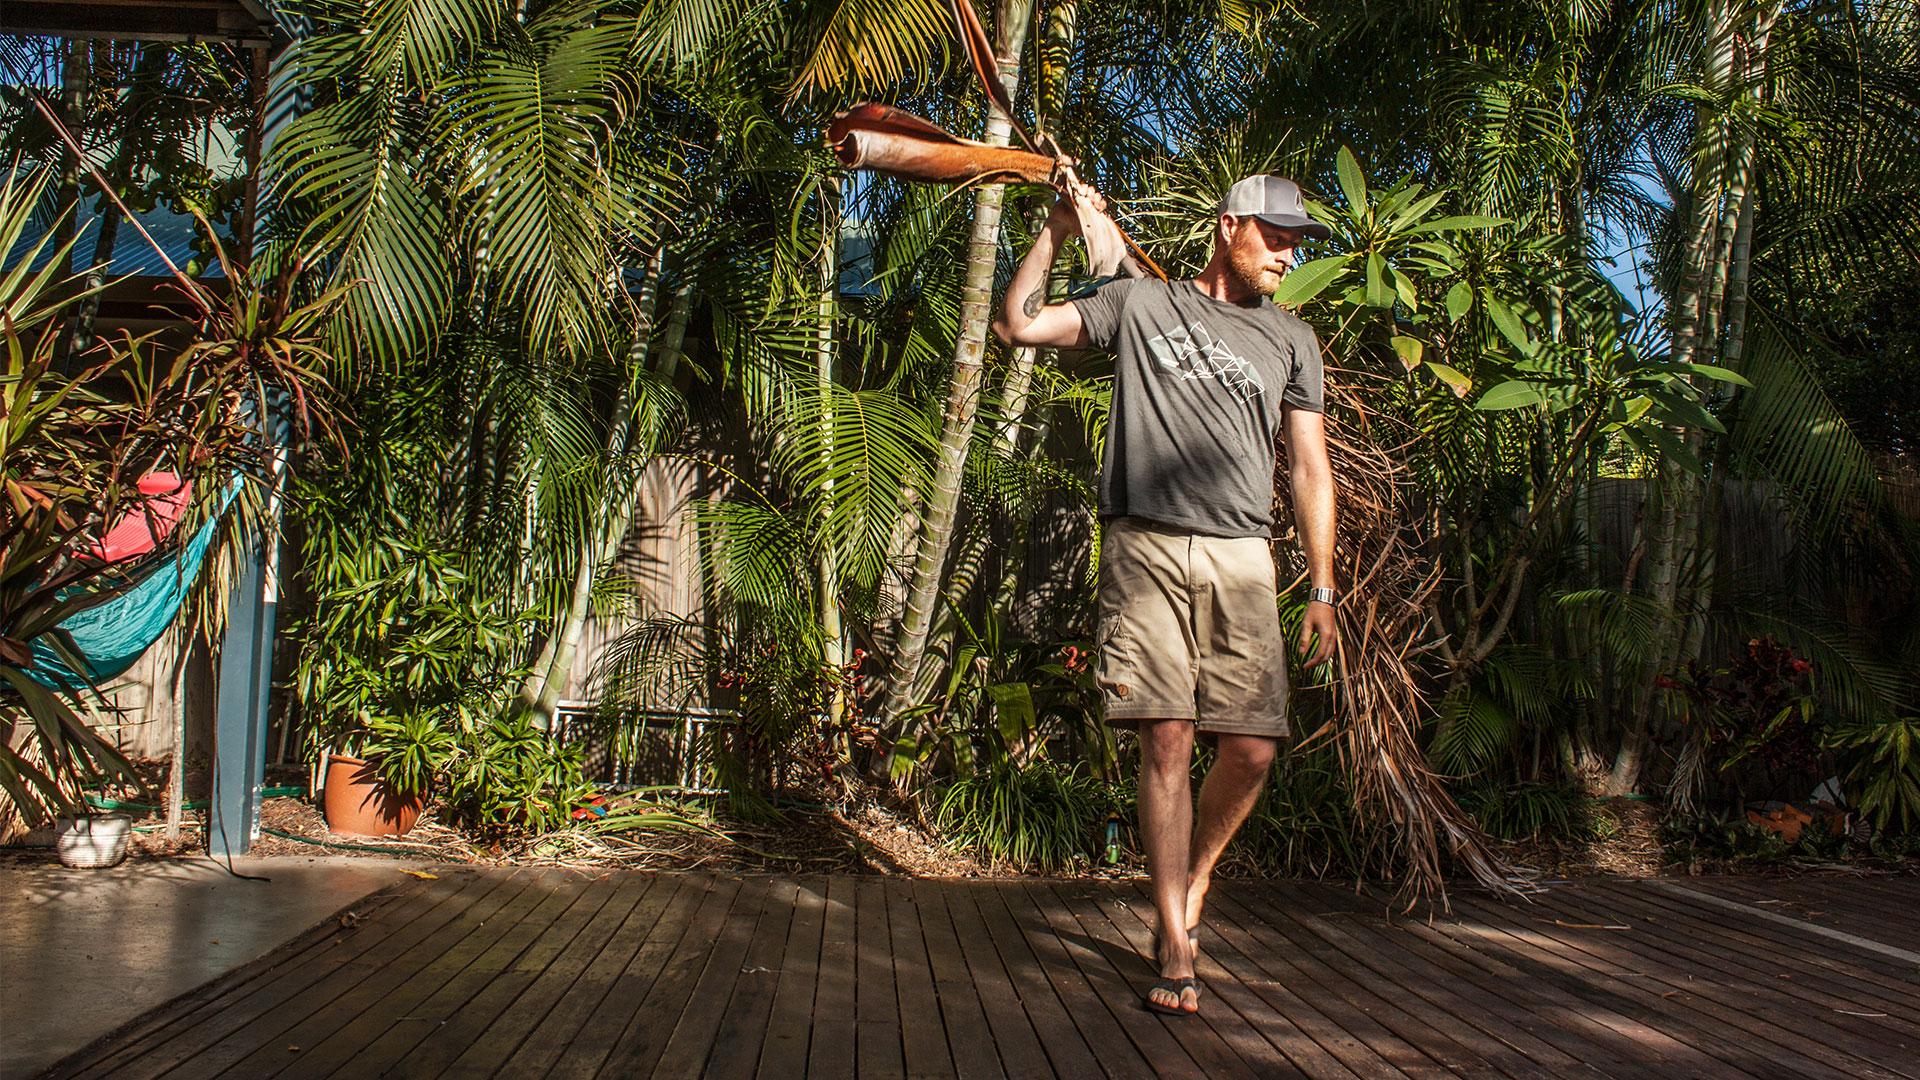 Palmblätter aufräumen